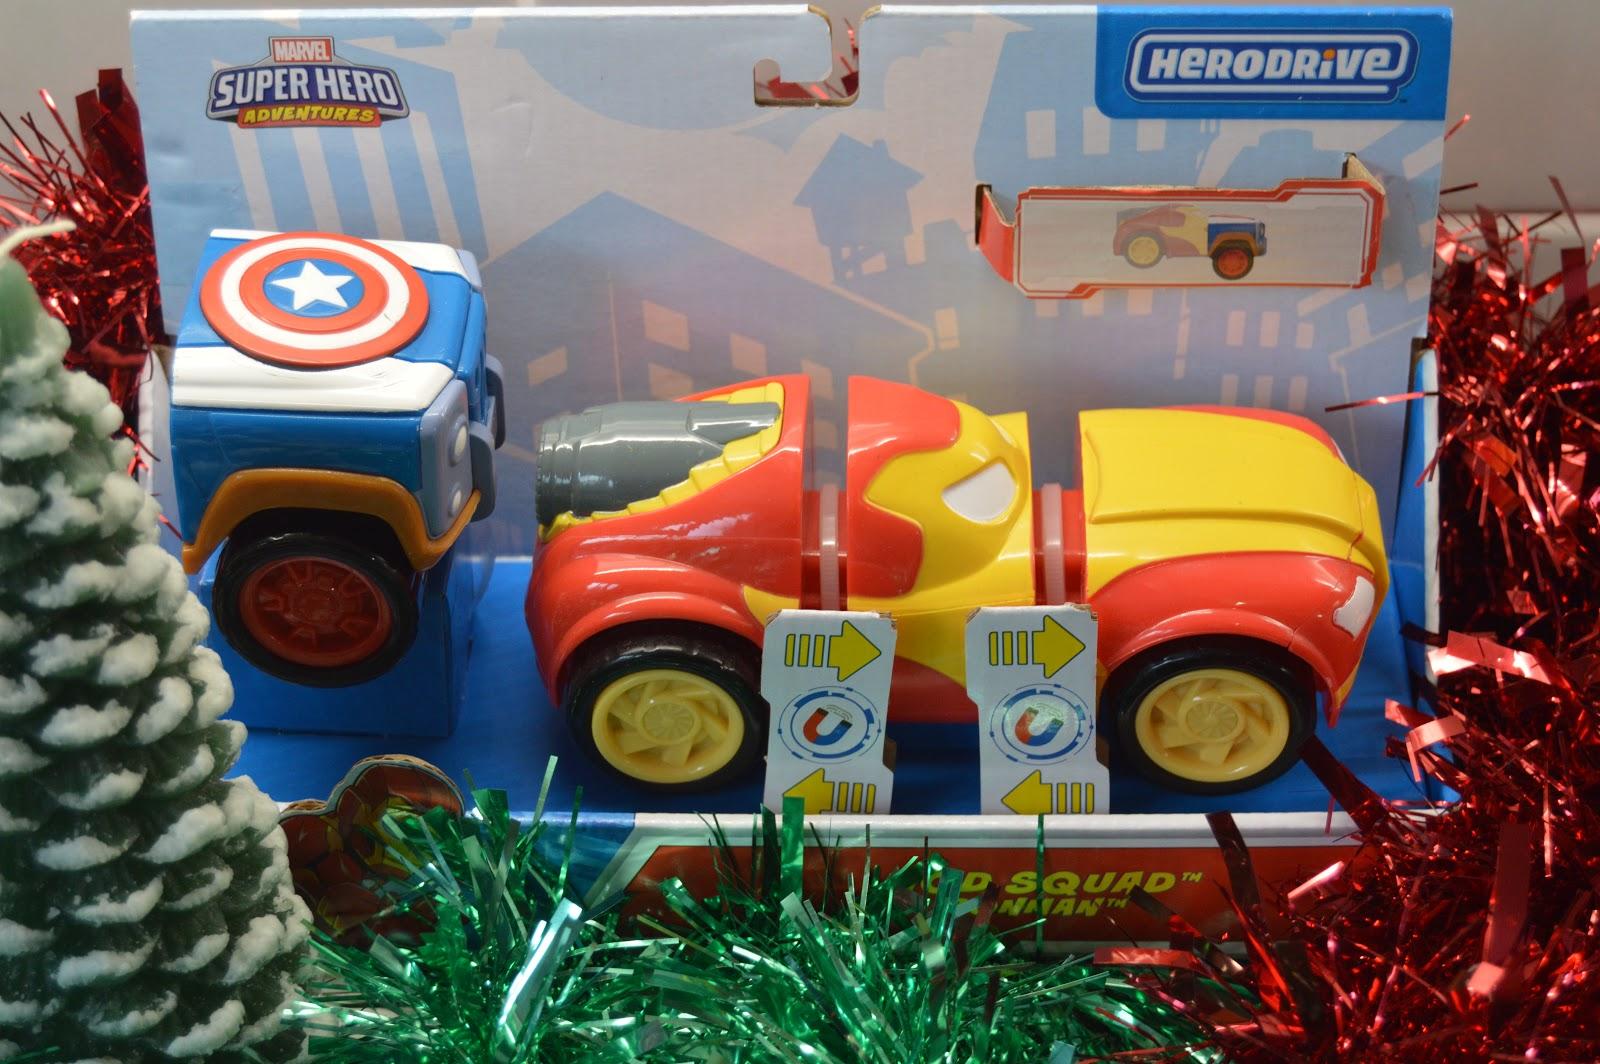 Marvel superheroes hero drive